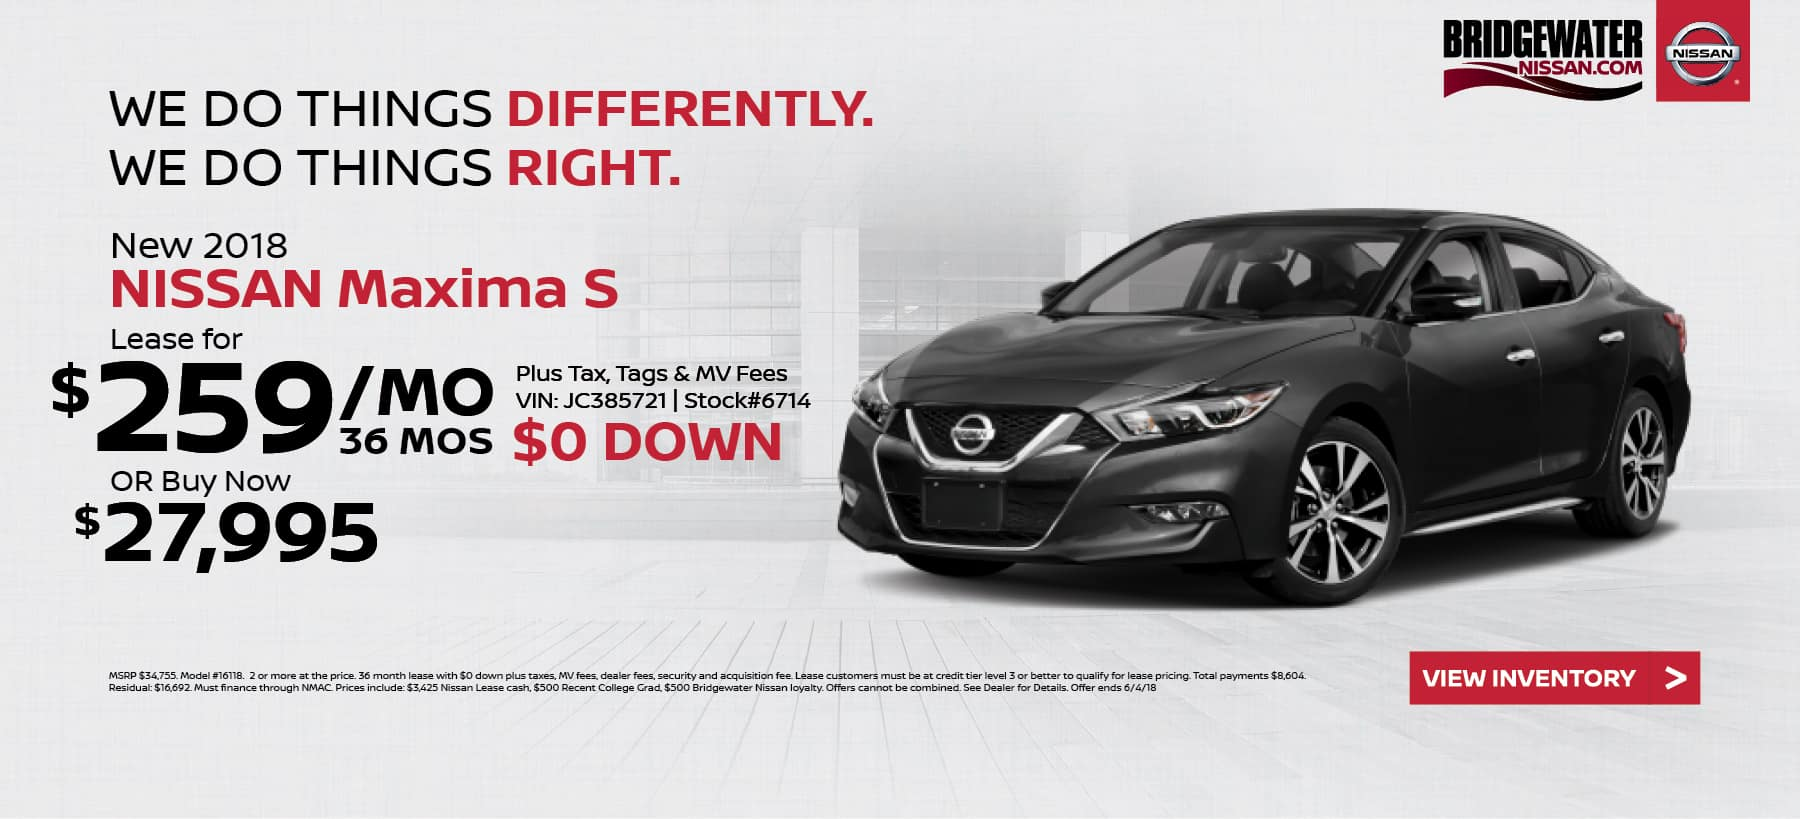 Nissan_Maxima Bridgewater Nissan May Homepage Offer